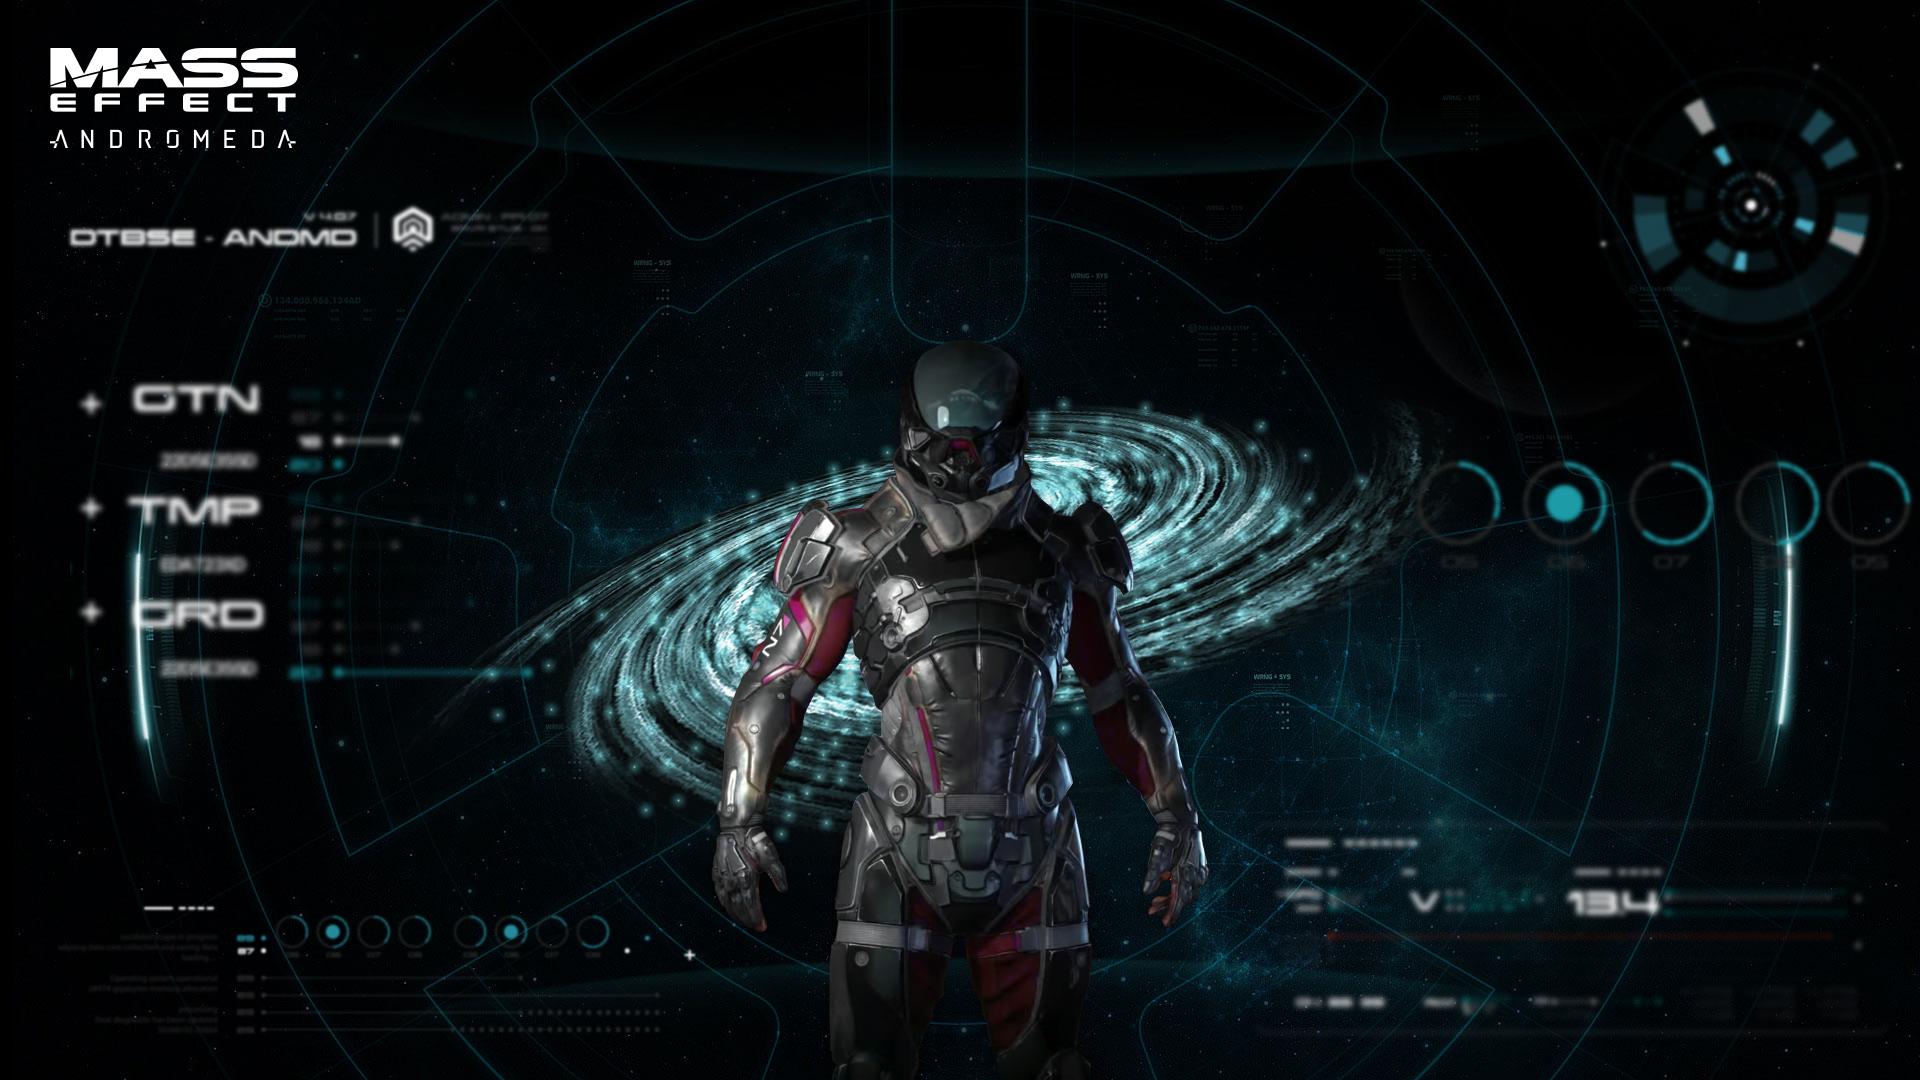 Mass Effect Andromeda Wallpaper By Jackshepardn7 On Deviantart